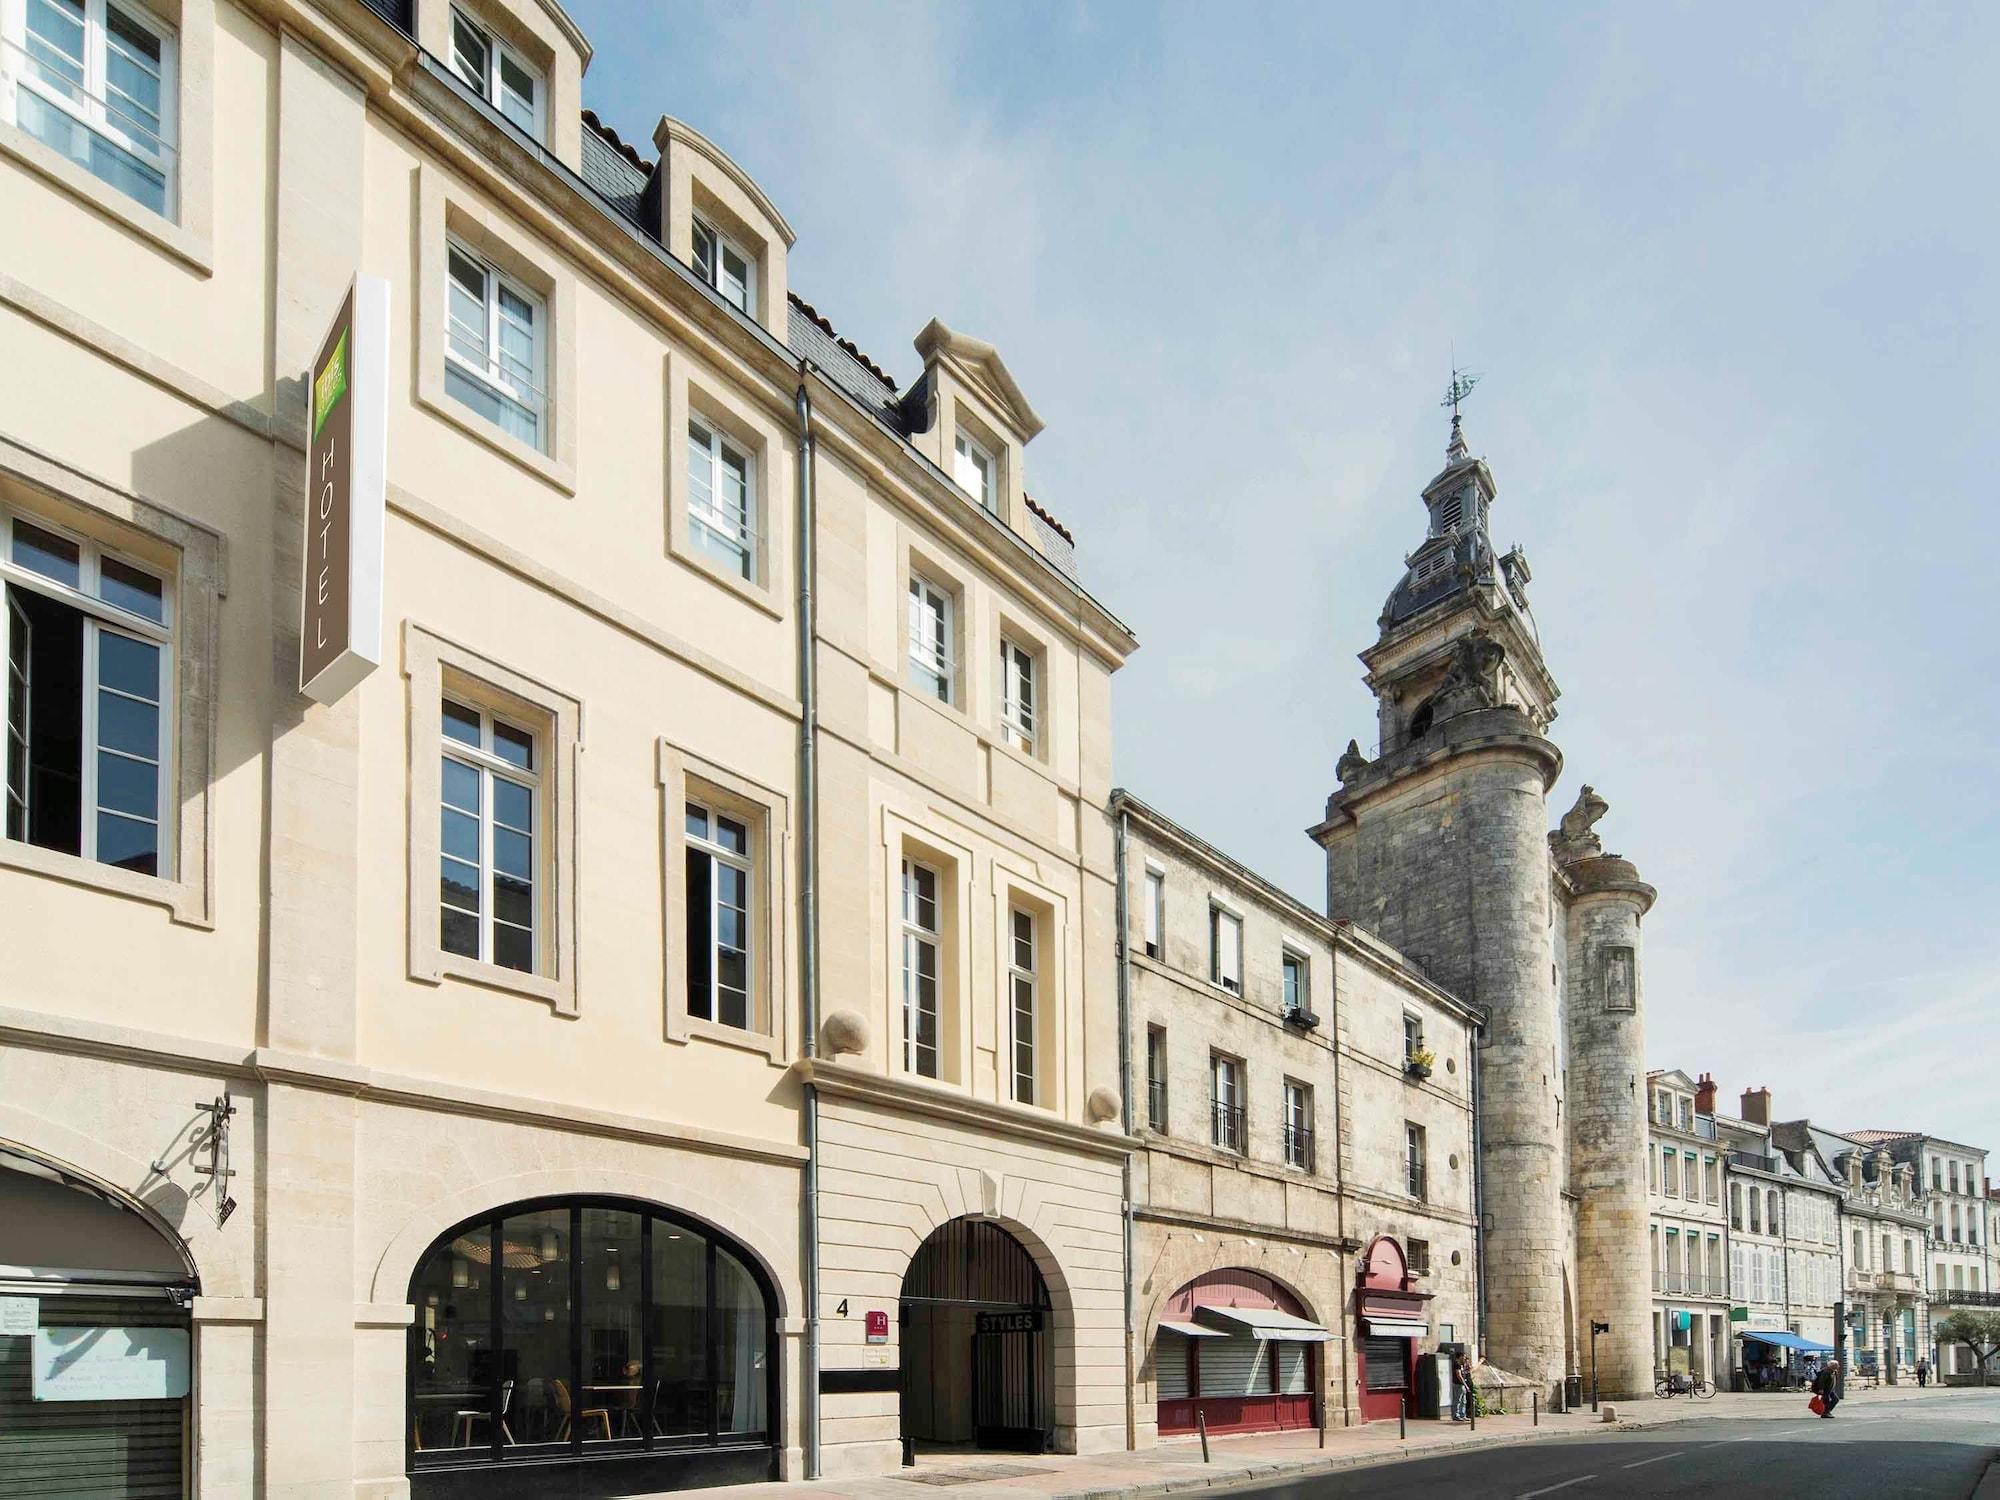 ibis Styles La Rochelle Centre, Charente-Maritime